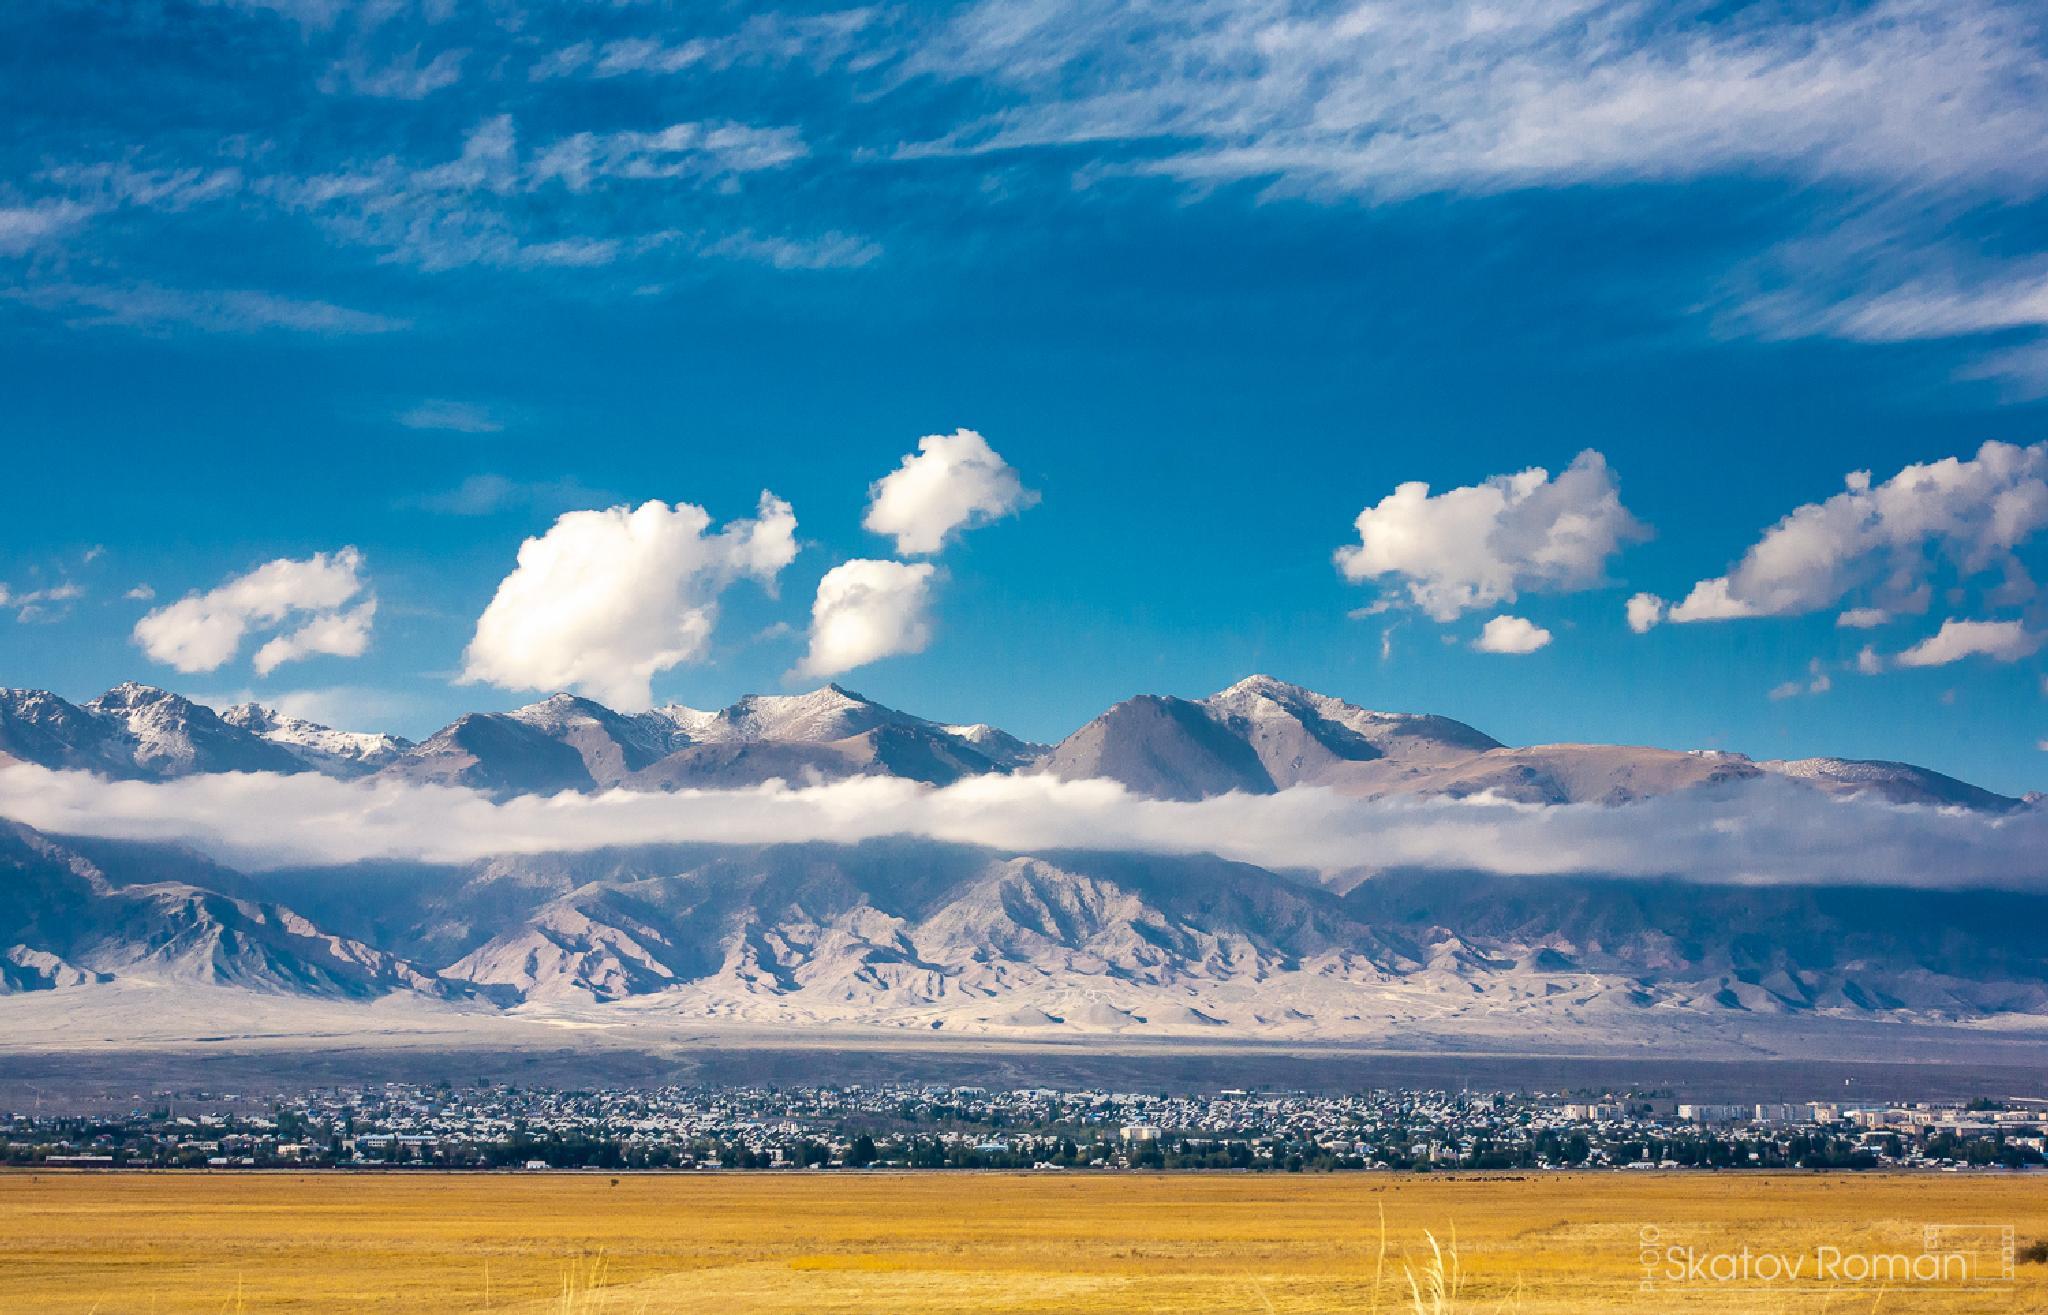 Balykchi. Kyrgyzstan by Skatov Roman